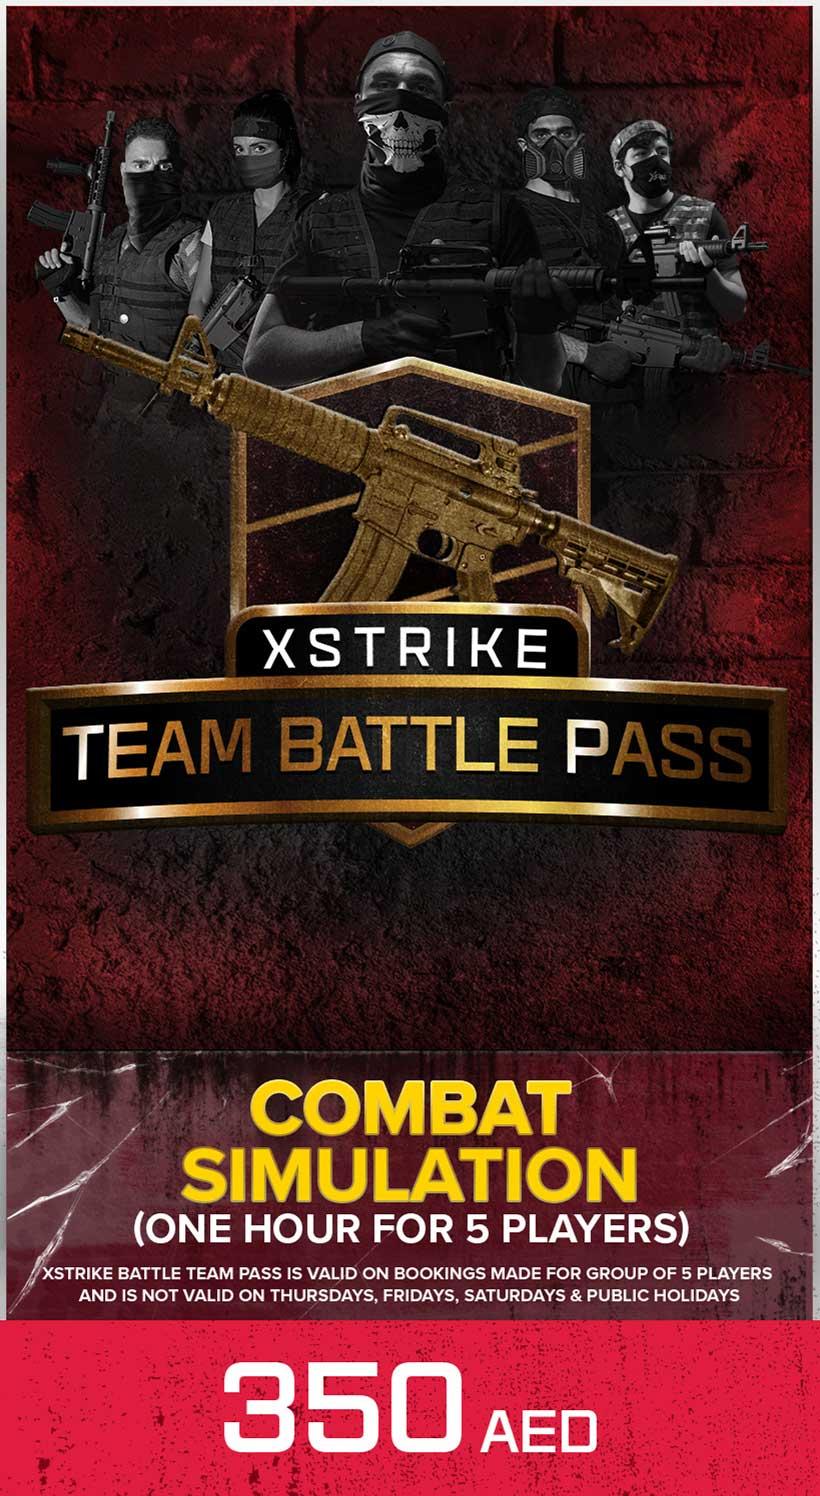 Combat Simulation Promotion